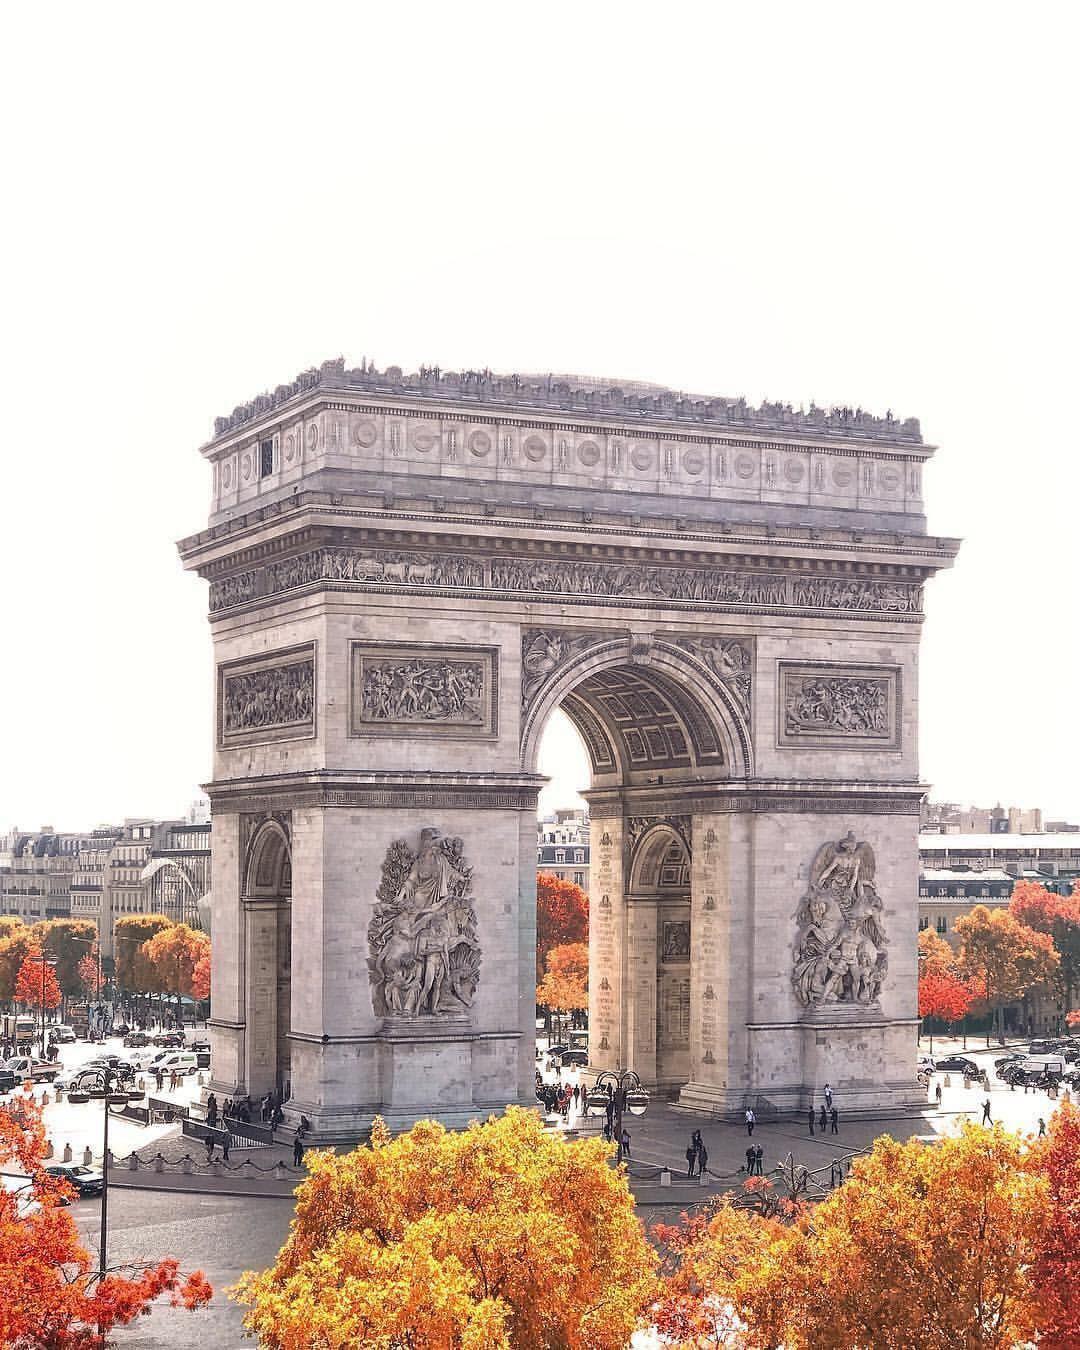 Sena Hospitality Design: PAD PARIS 2019 BEST GALLERIES